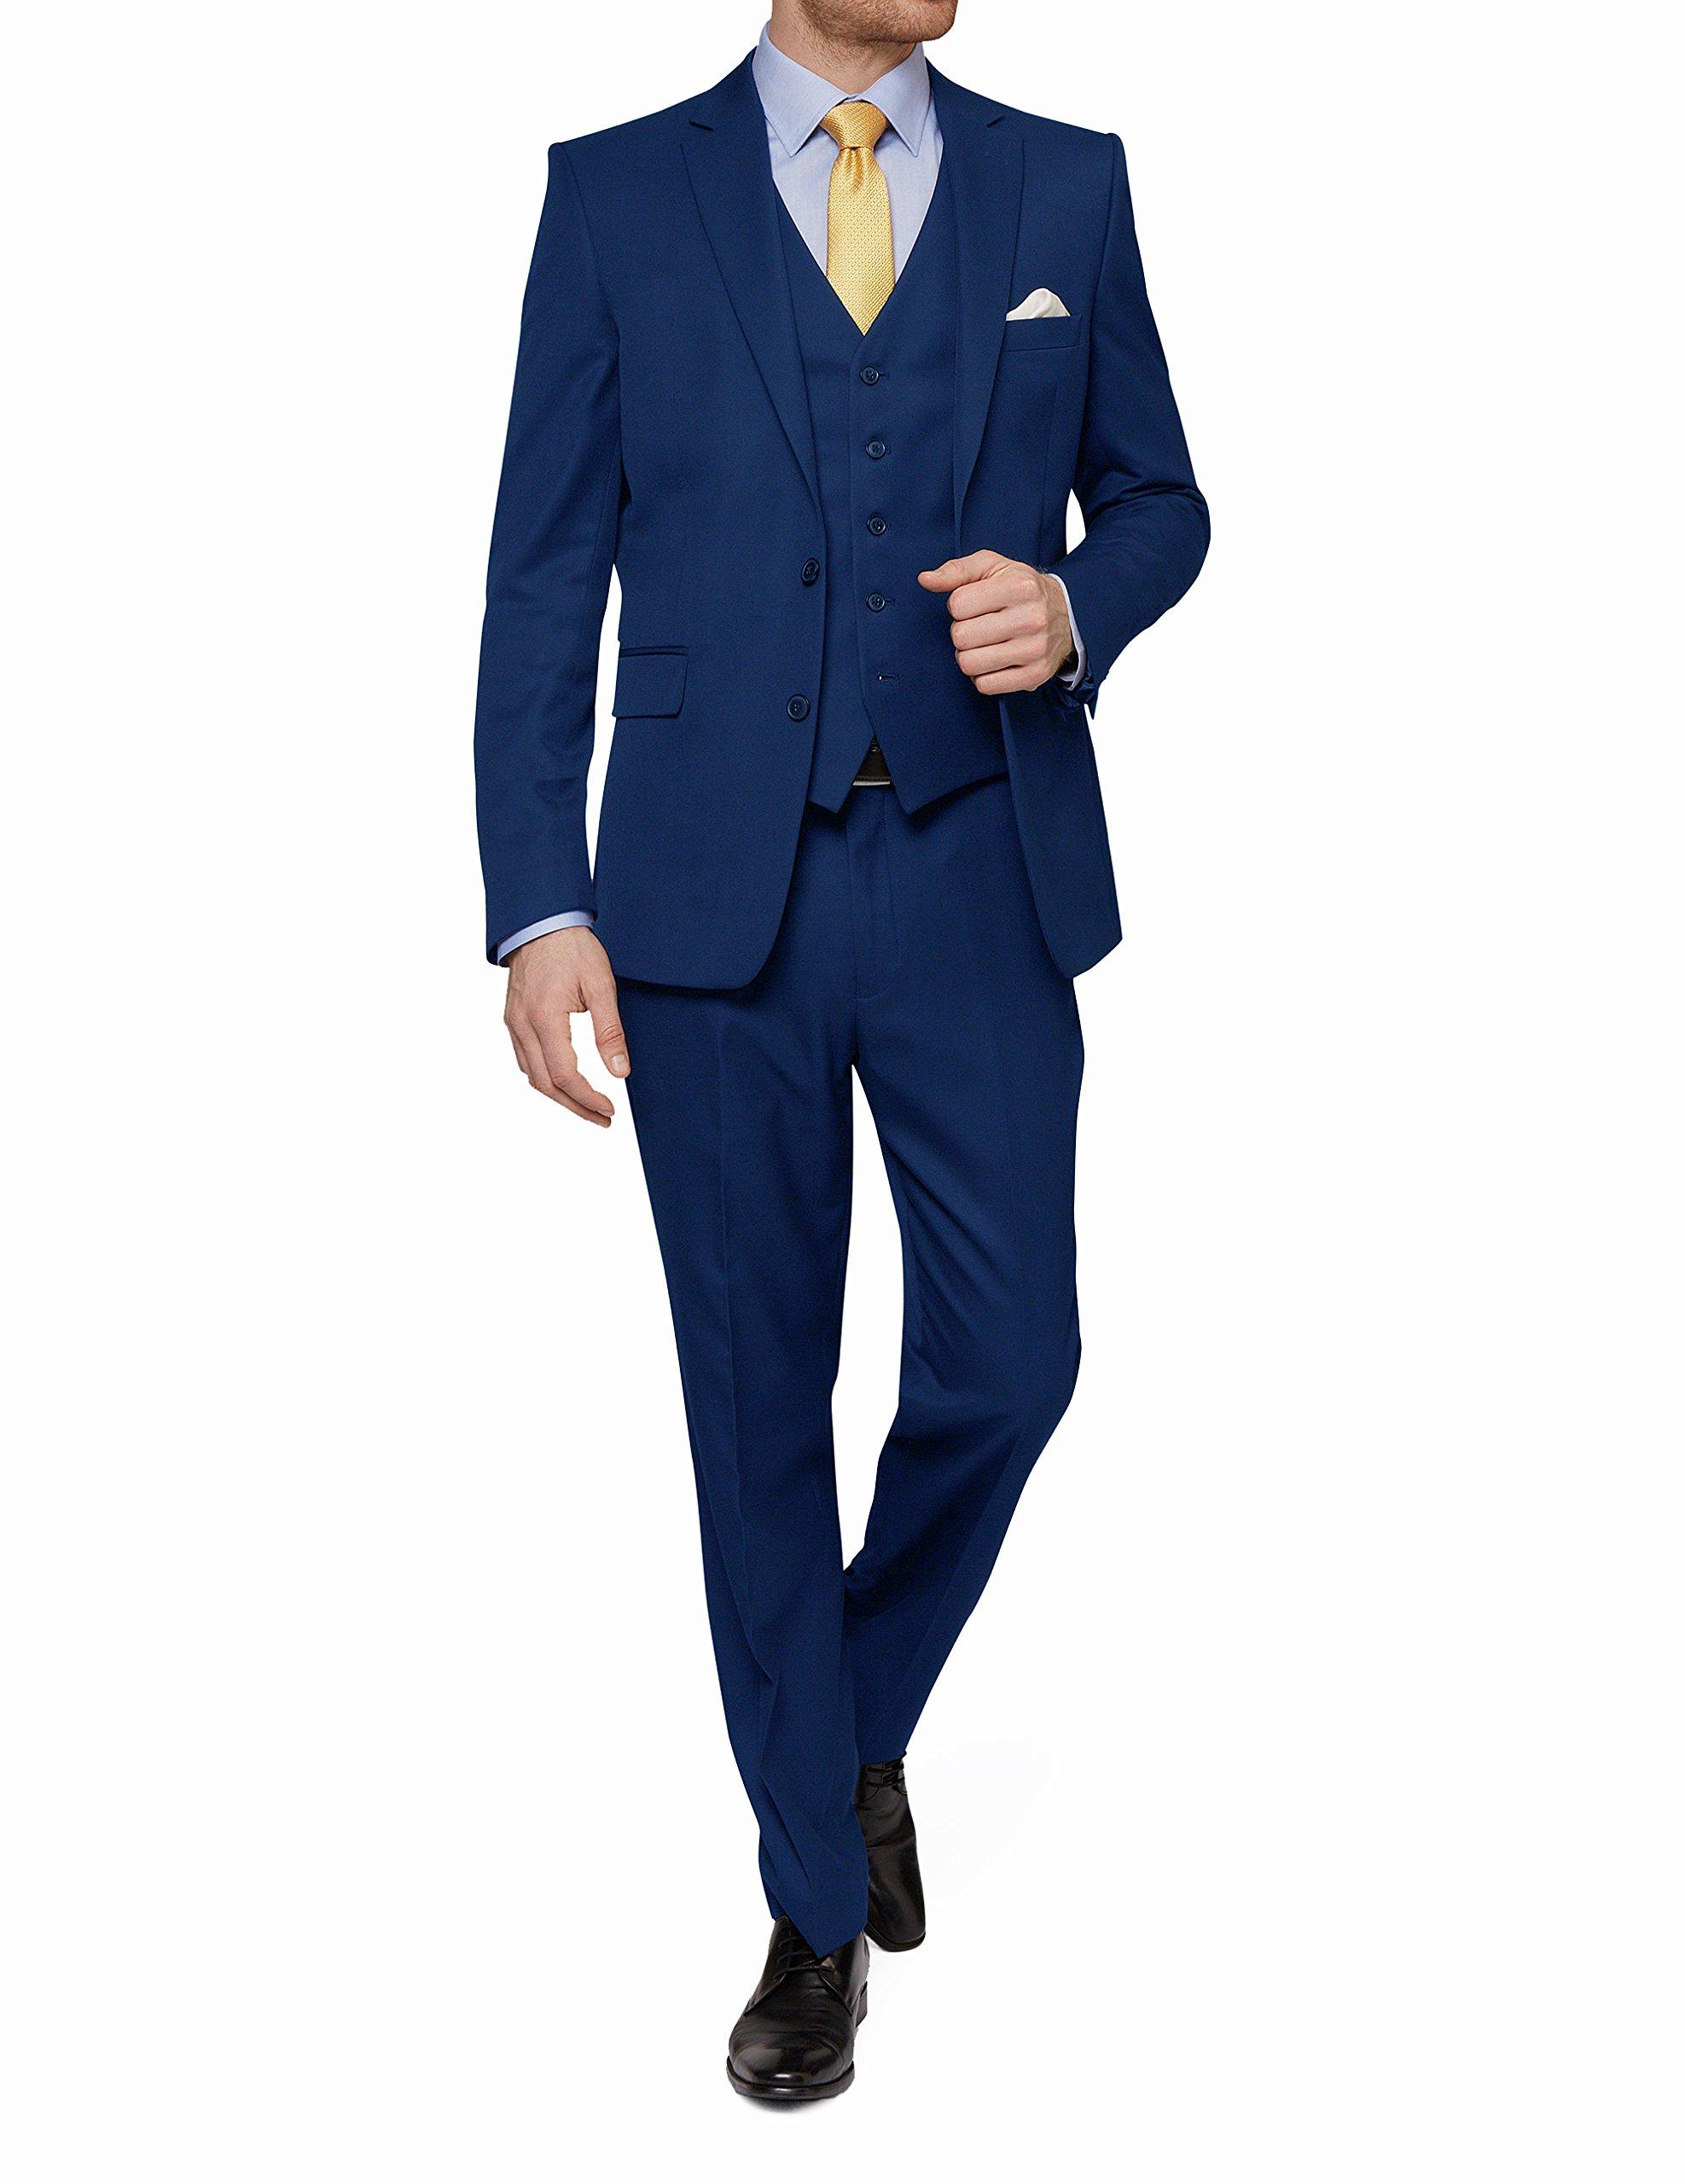 MDRN Uomo Mens Slim Fit 3 Piece Suit, Blue, Size 42Rx36W